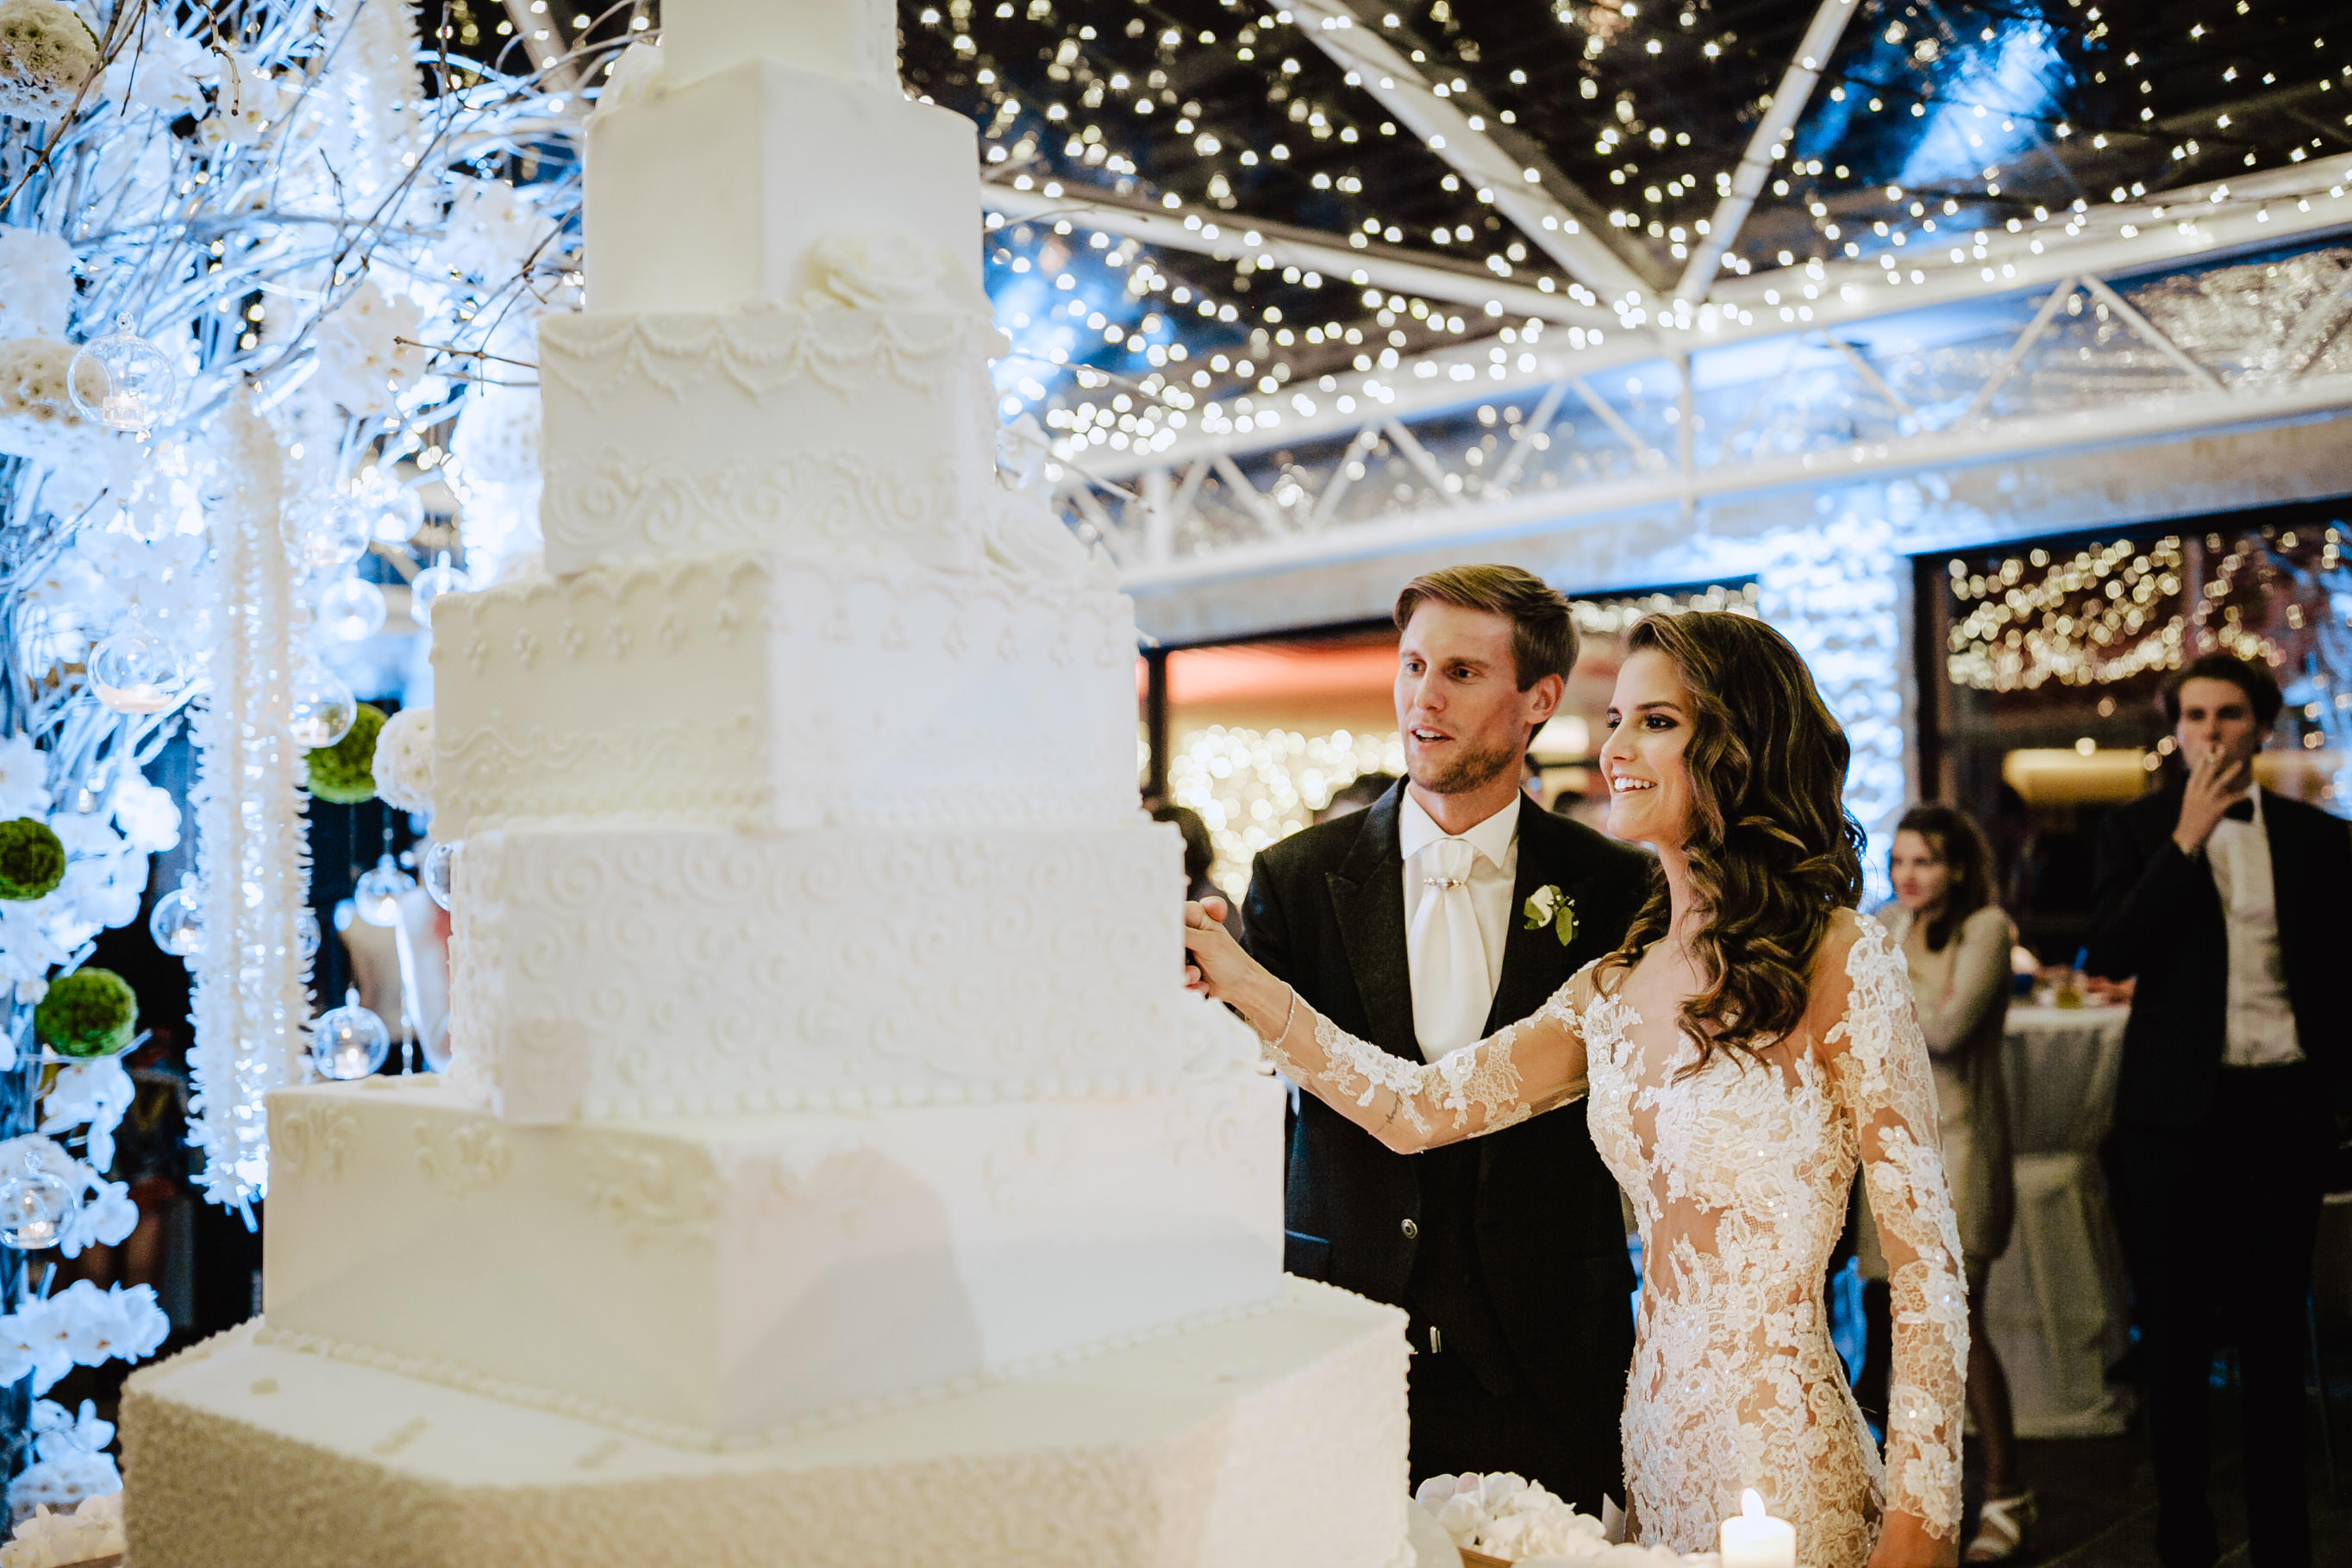 wedding cake cut andreas seppi alpina dolomites hotel valgardena